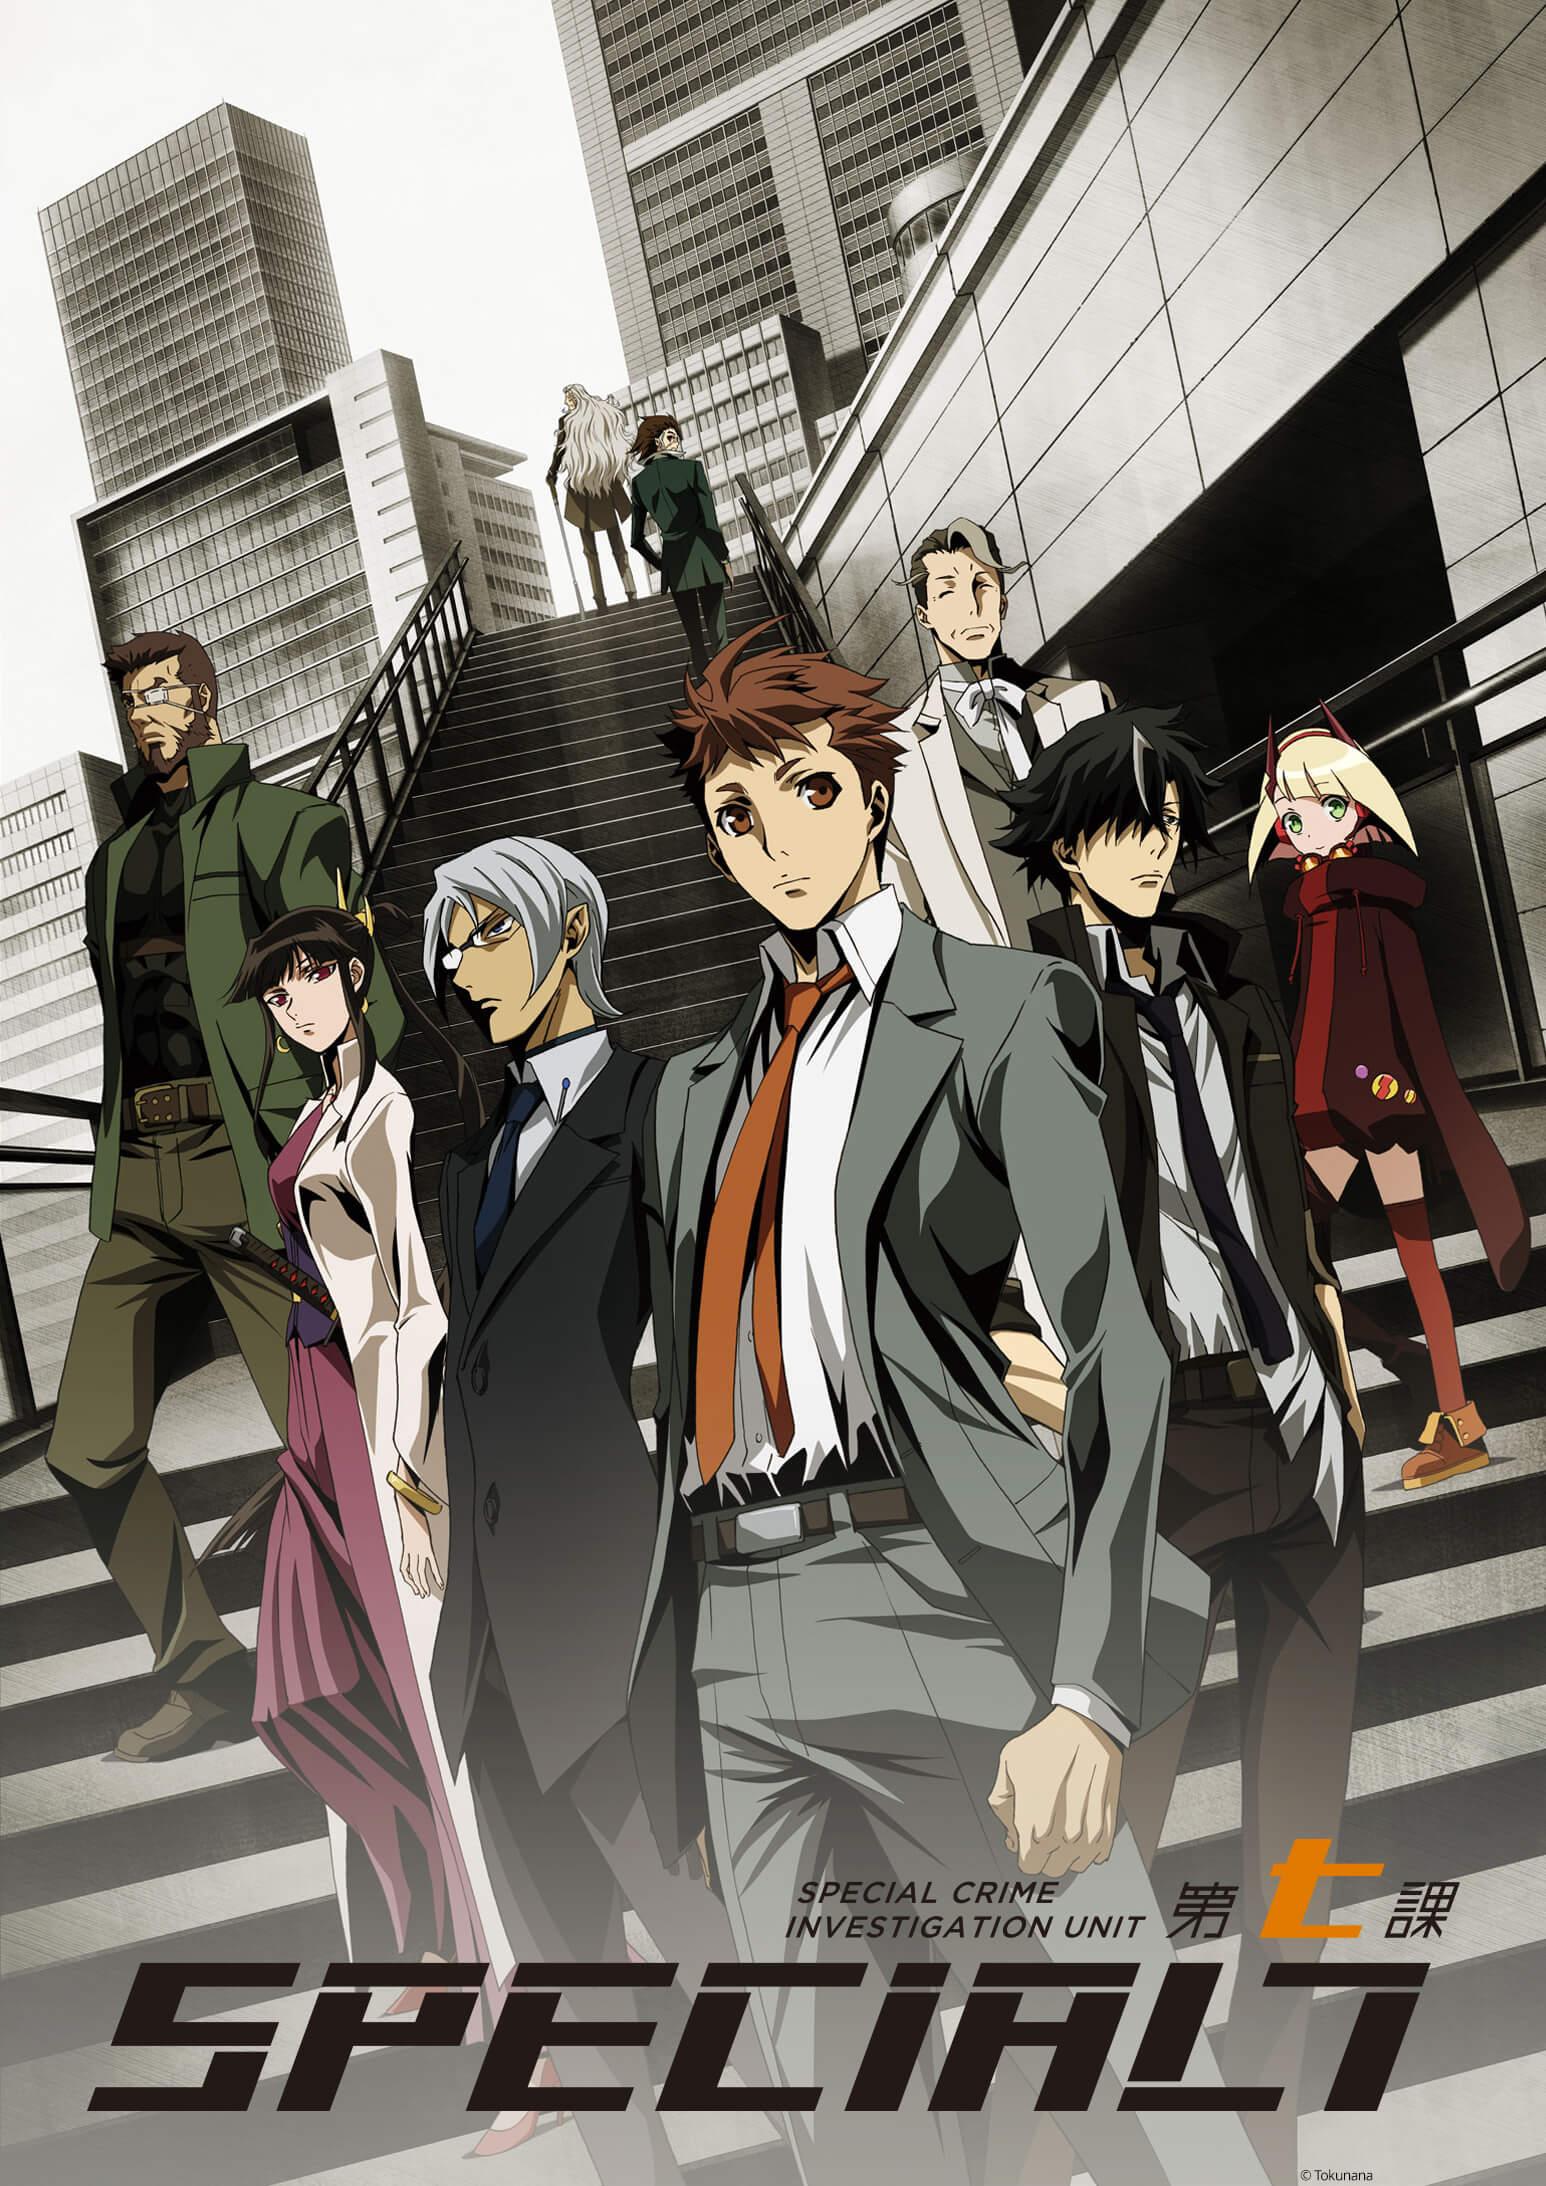 Special Crime Investigation Unit – Special 7